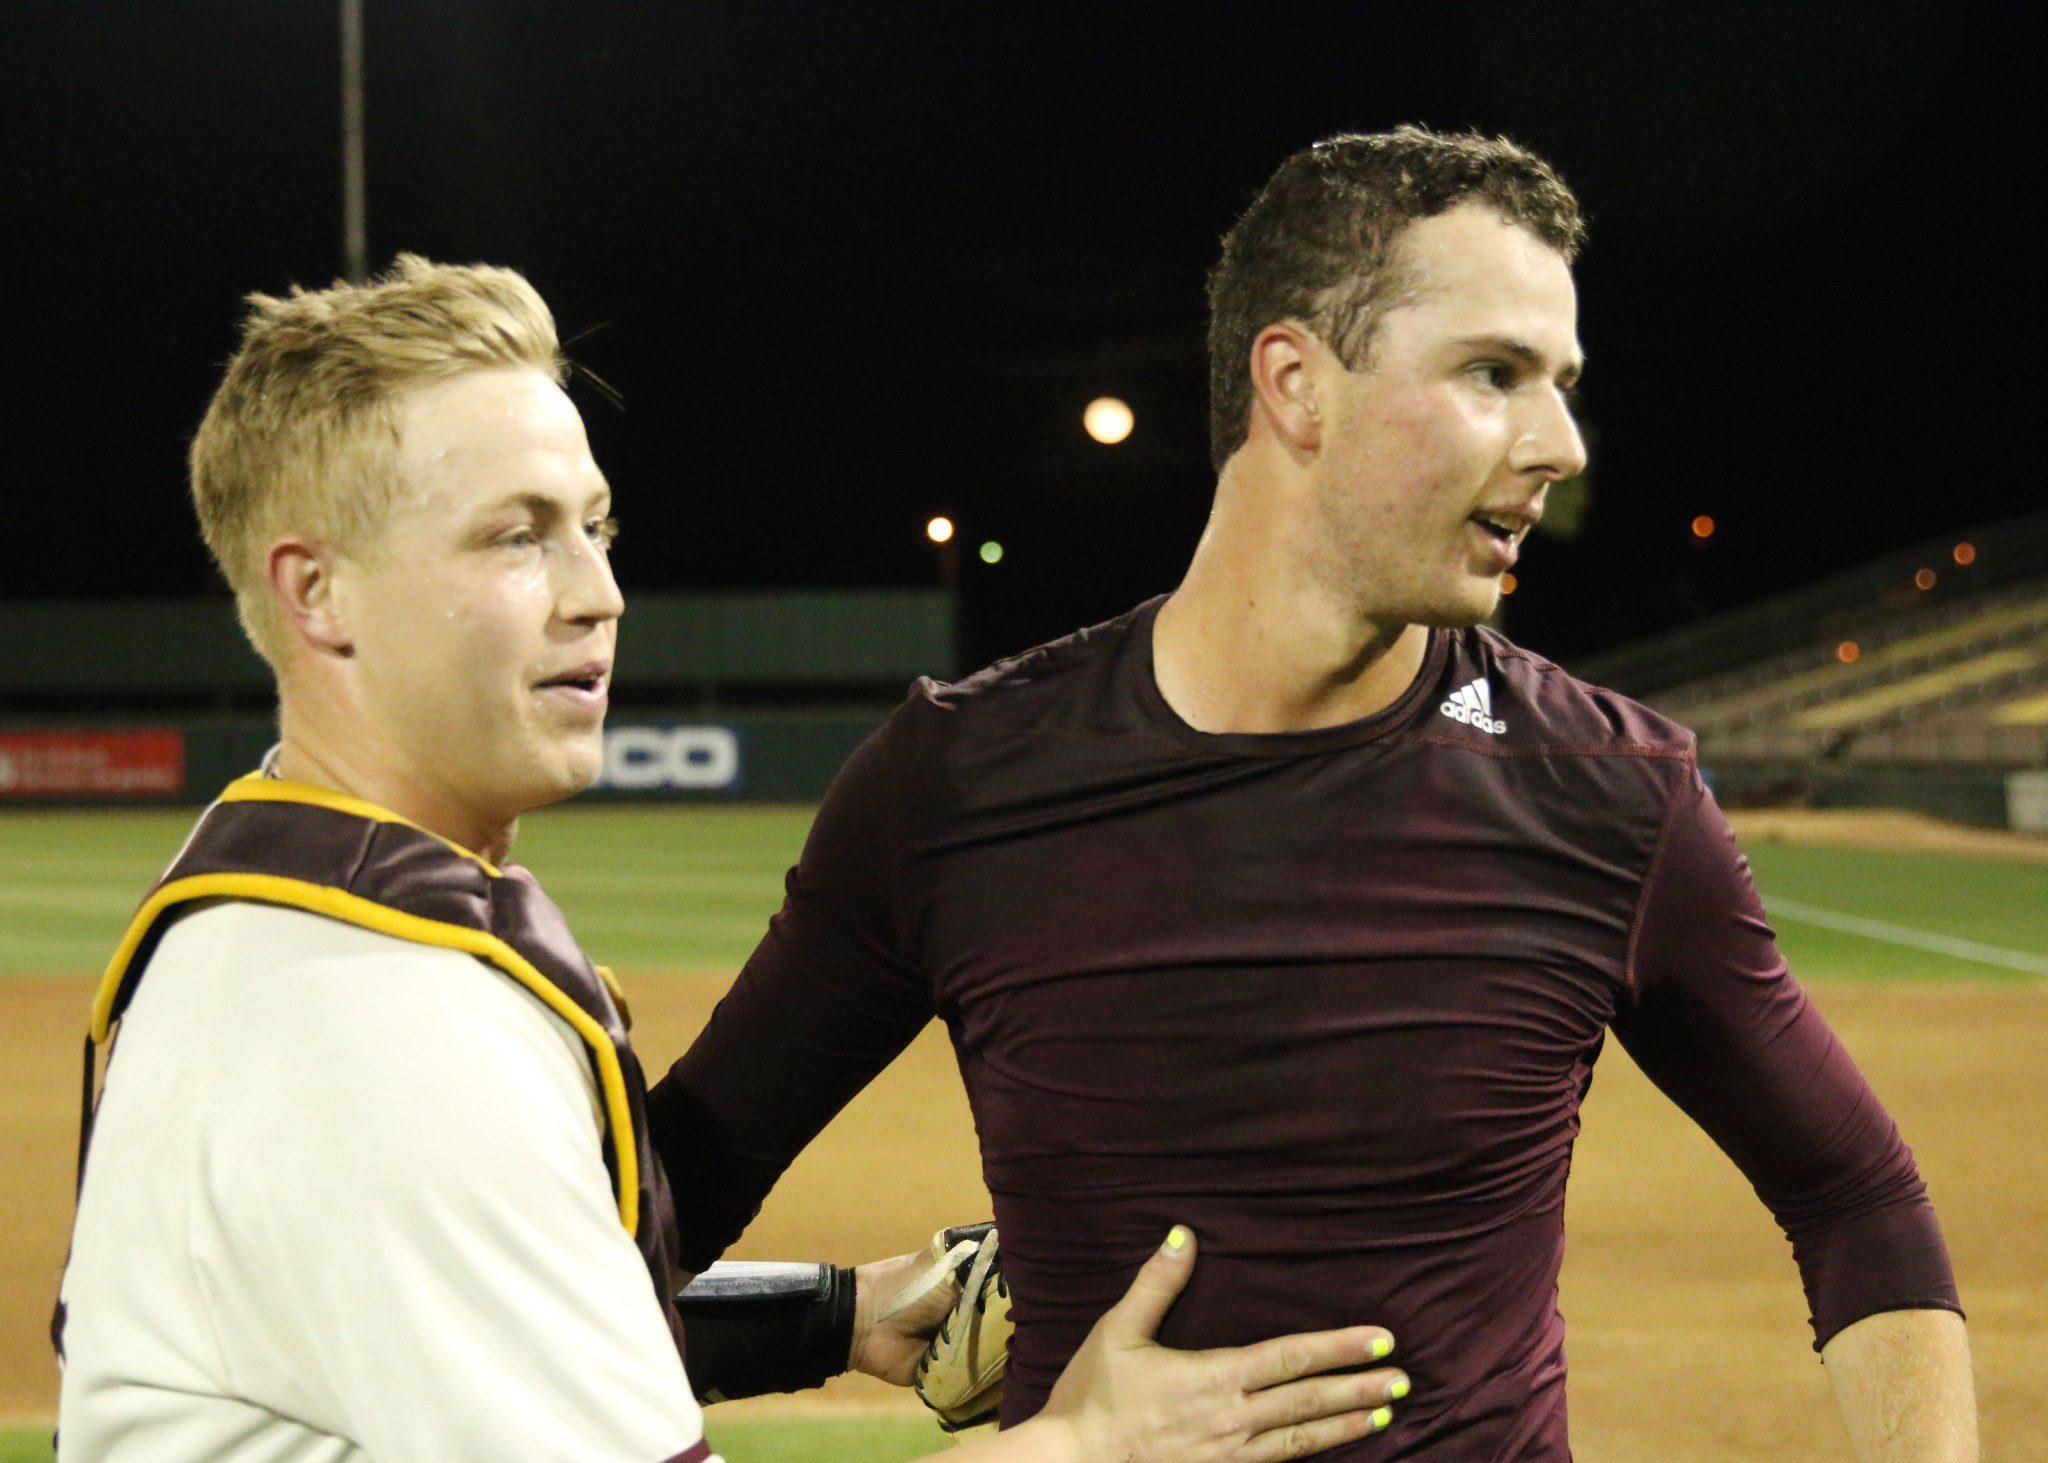 Ryan Hingst celebrates his no-hitter with his catcher Brian Serven (Blake Benard/Blaze Radio)